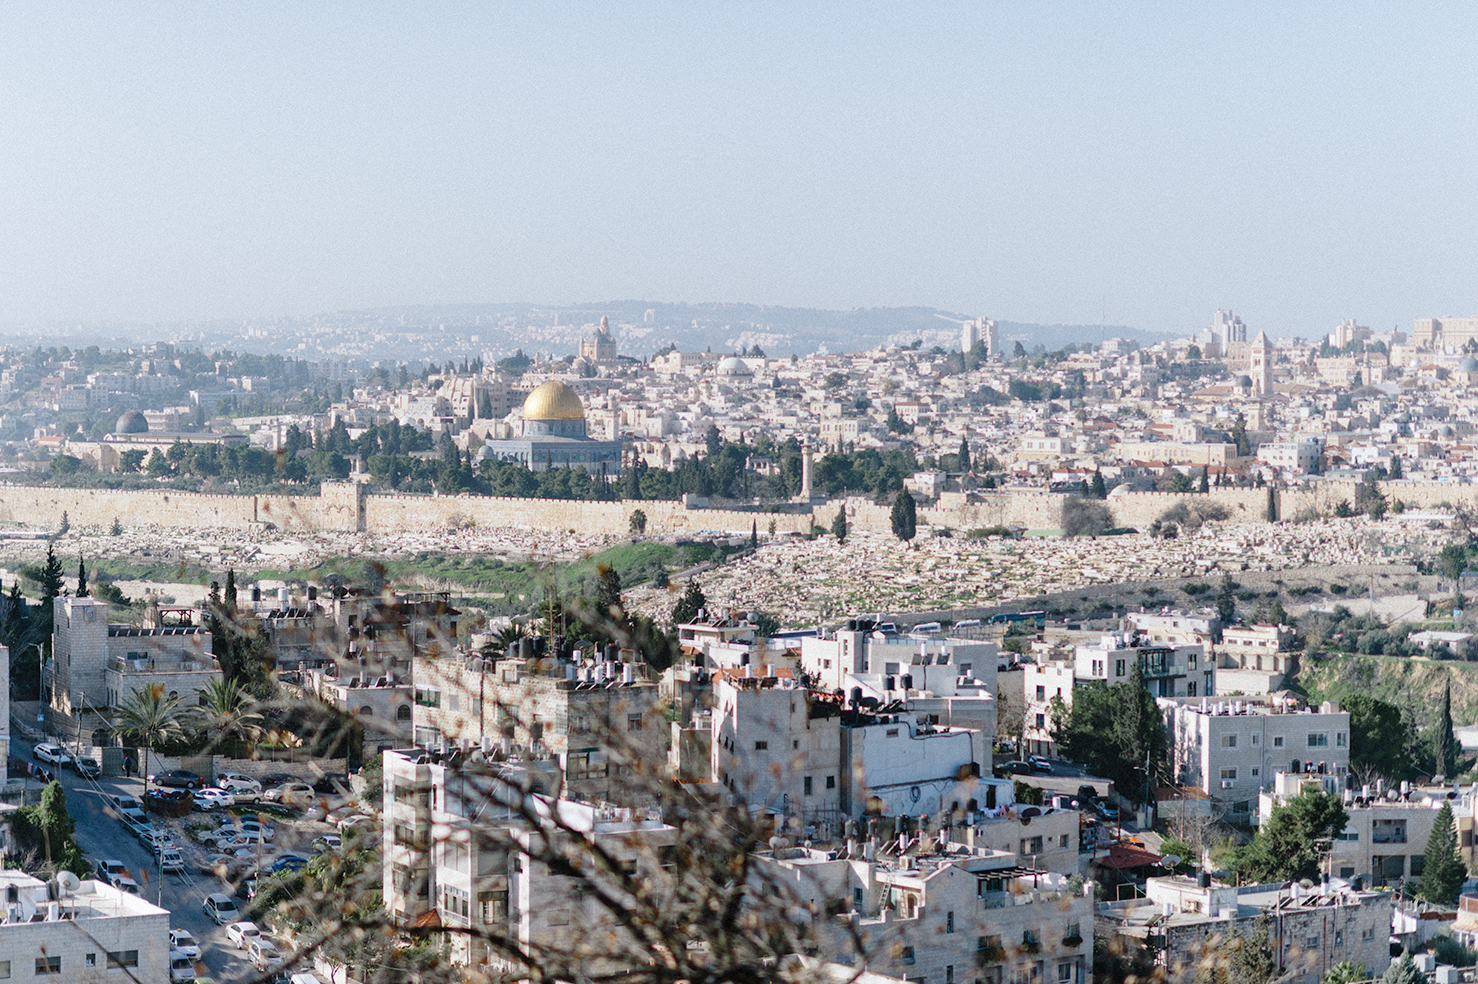 20190126_BYU-JERUSALEM_003.jpg